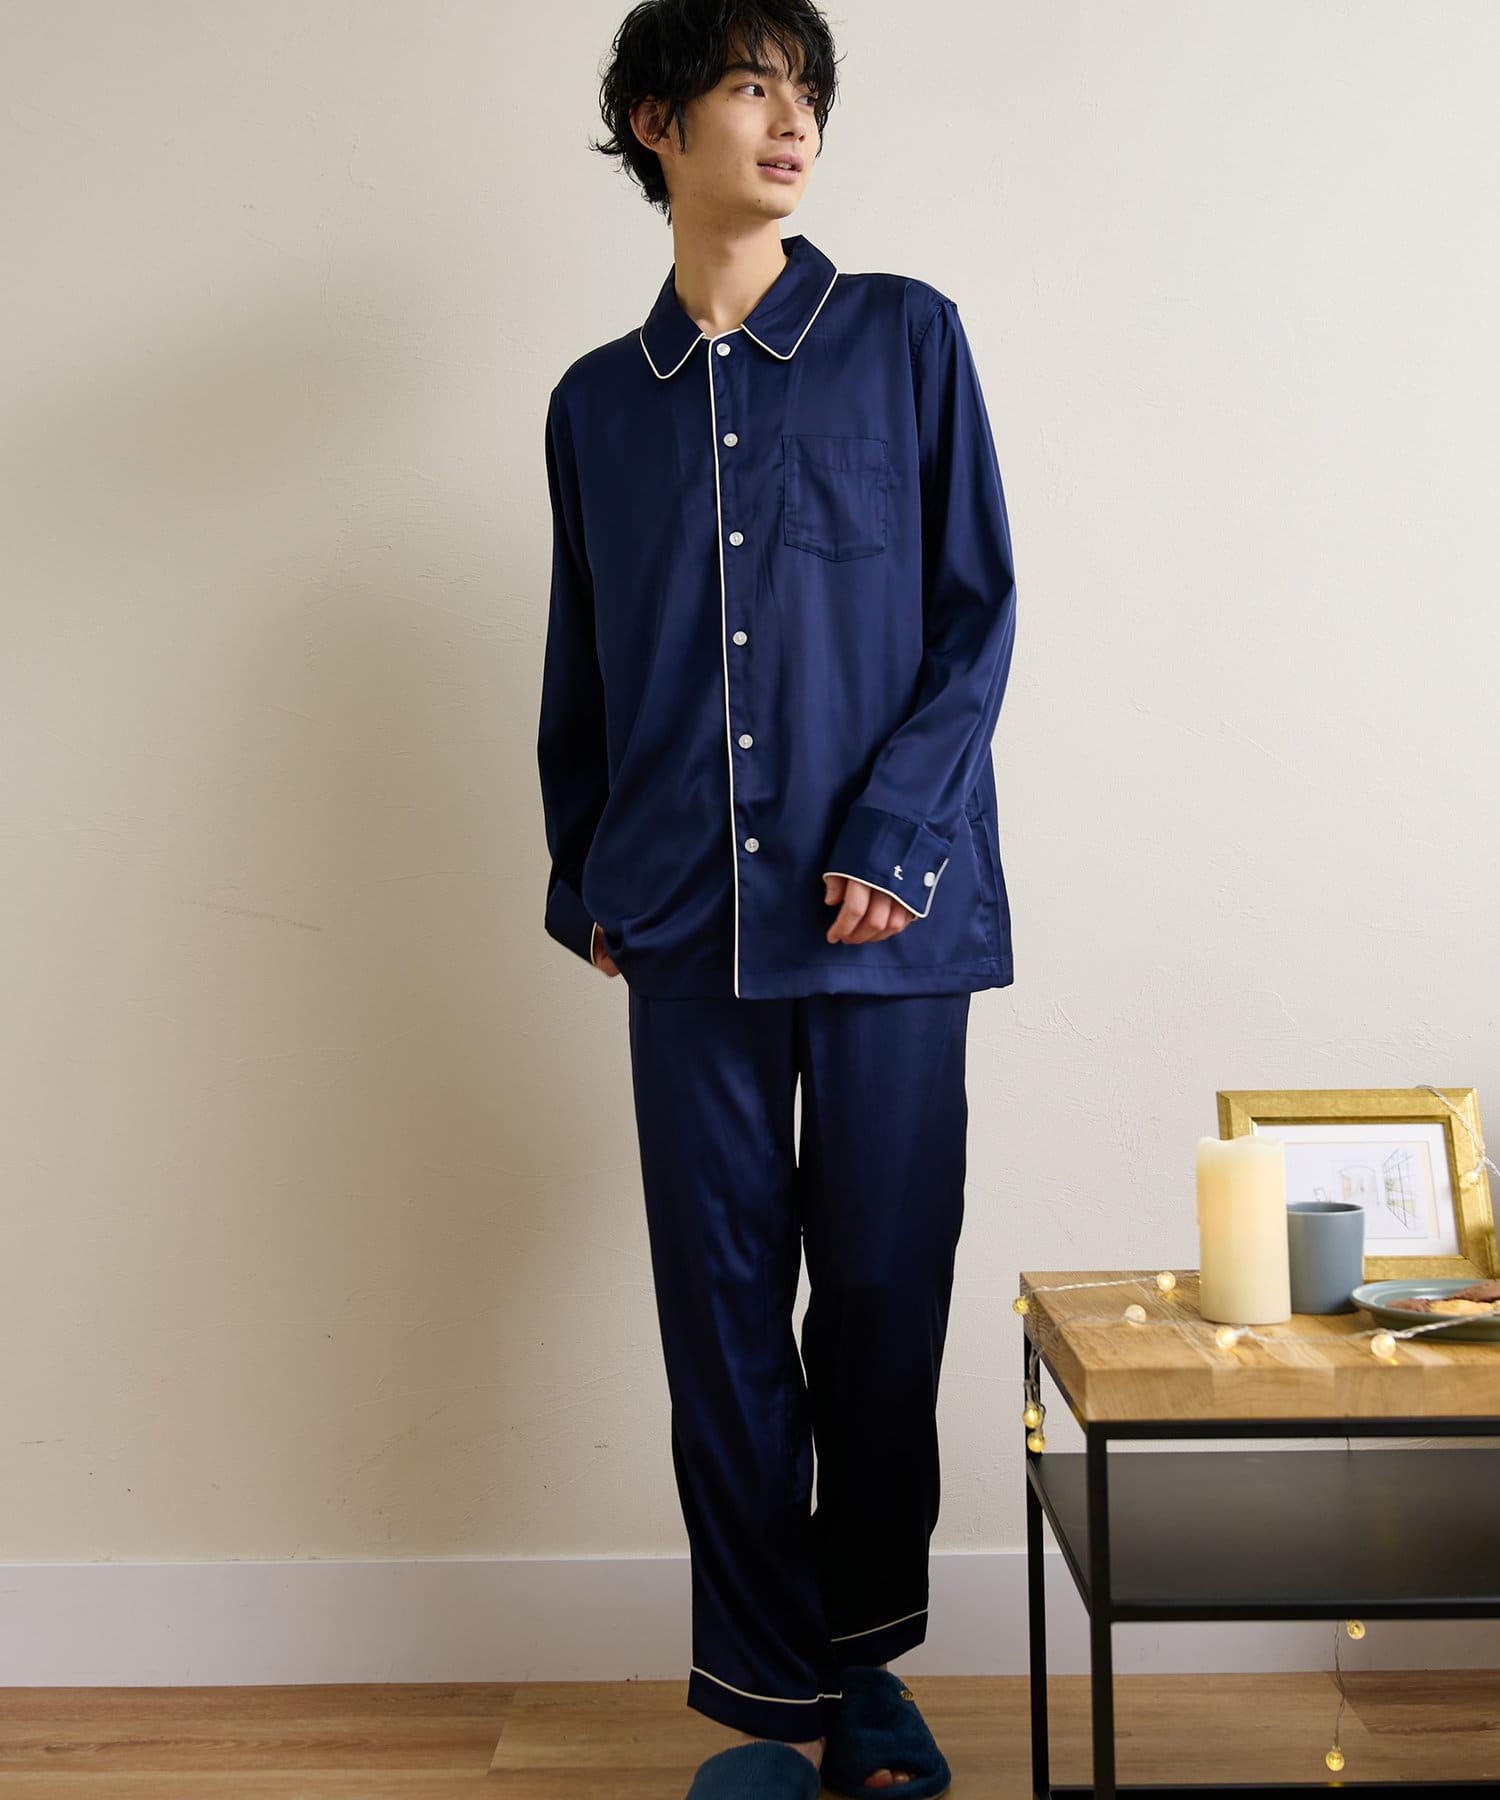 TERRITOIRE(テリトワール) ■ペア割対象■MENS シルクタッチサテンパジャマ 上下セット